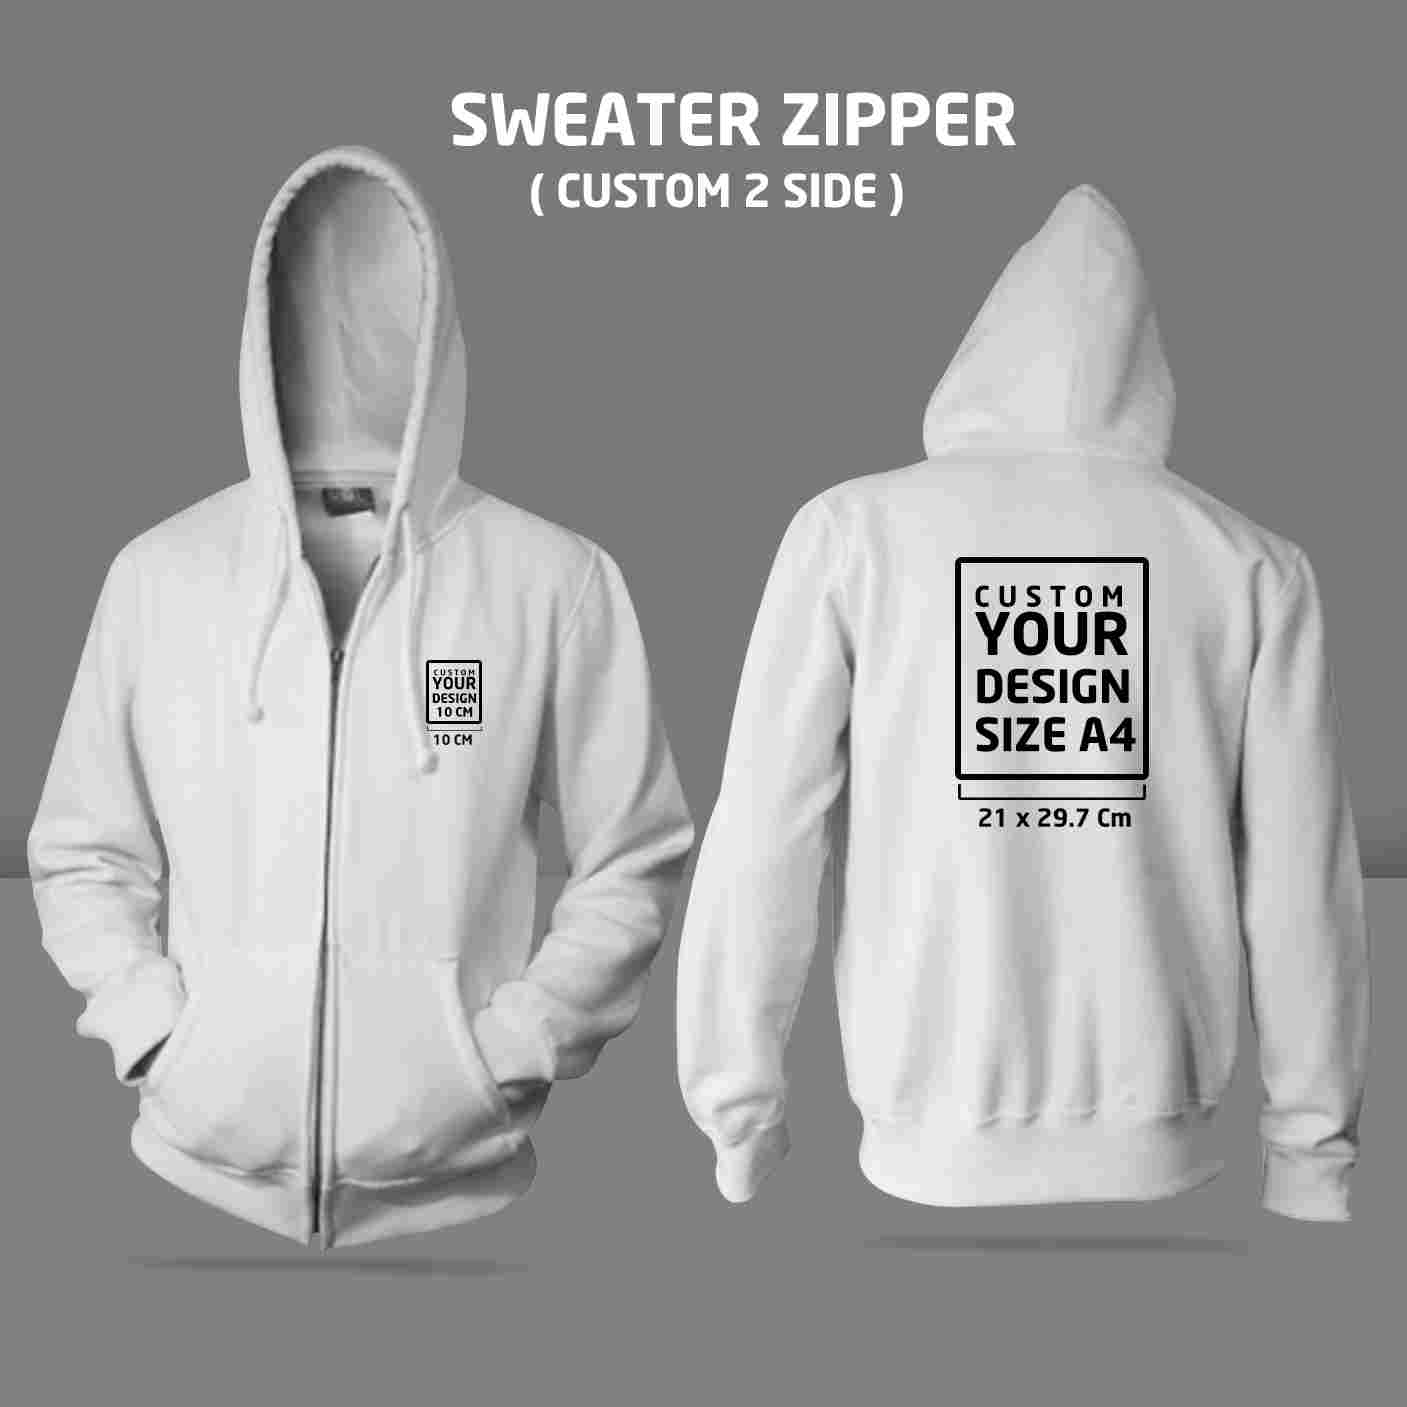 Sweater Zipper Custom 2 Side ( XXL )